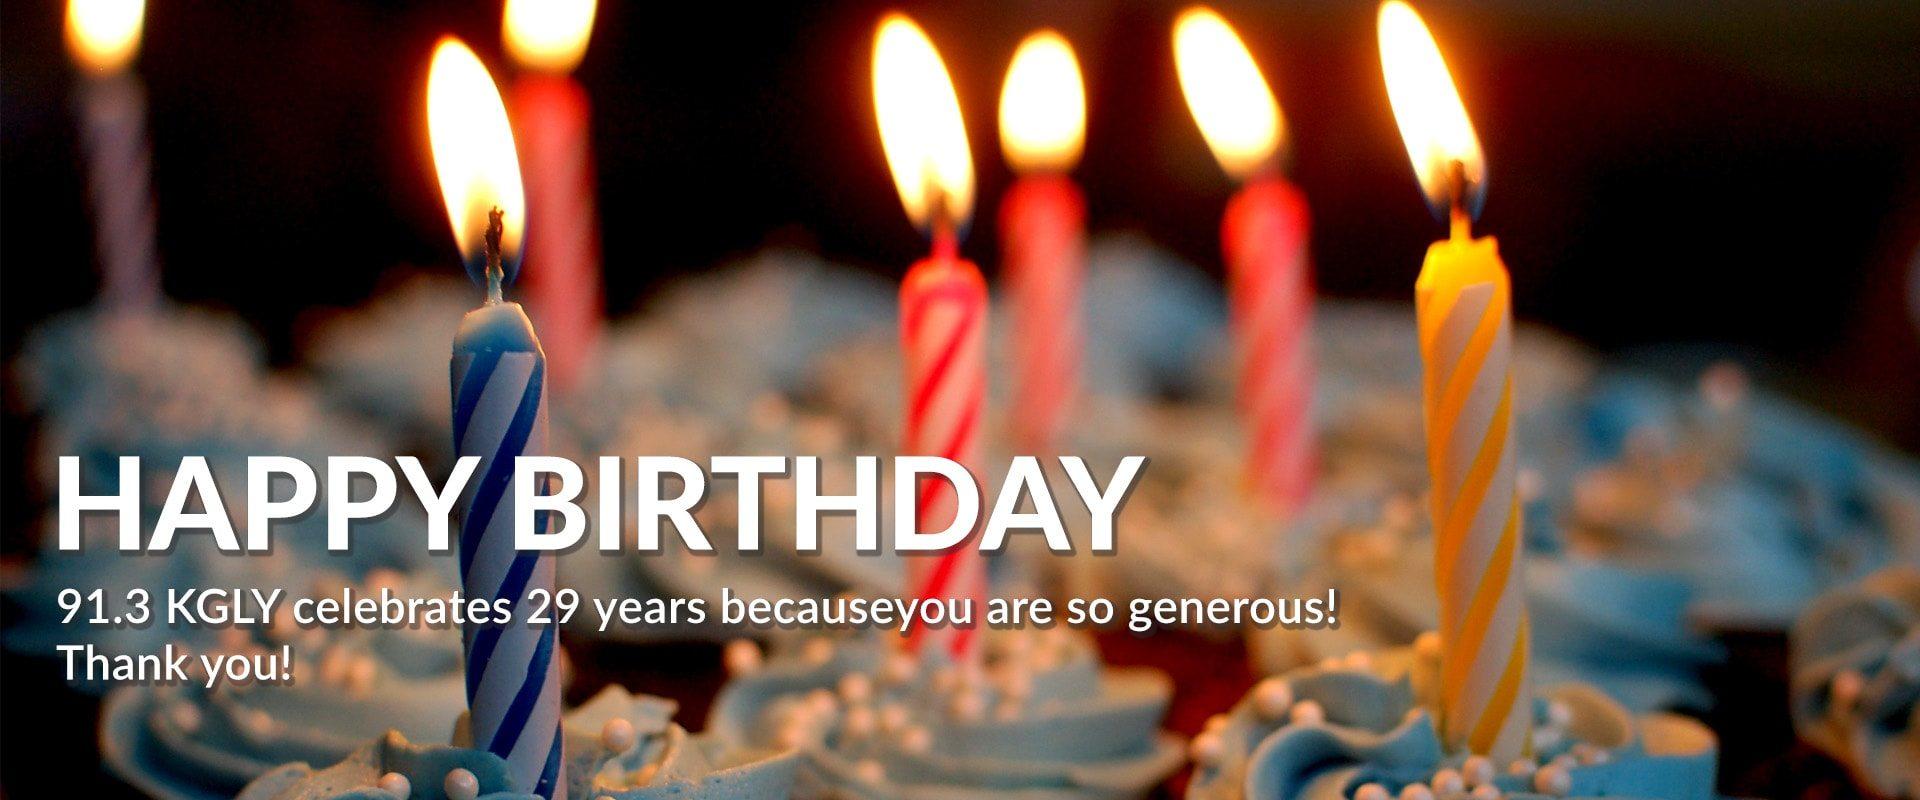 91.3 KGLY Christian Radio East Texas Christian Radio Happy Birthday to KGLY